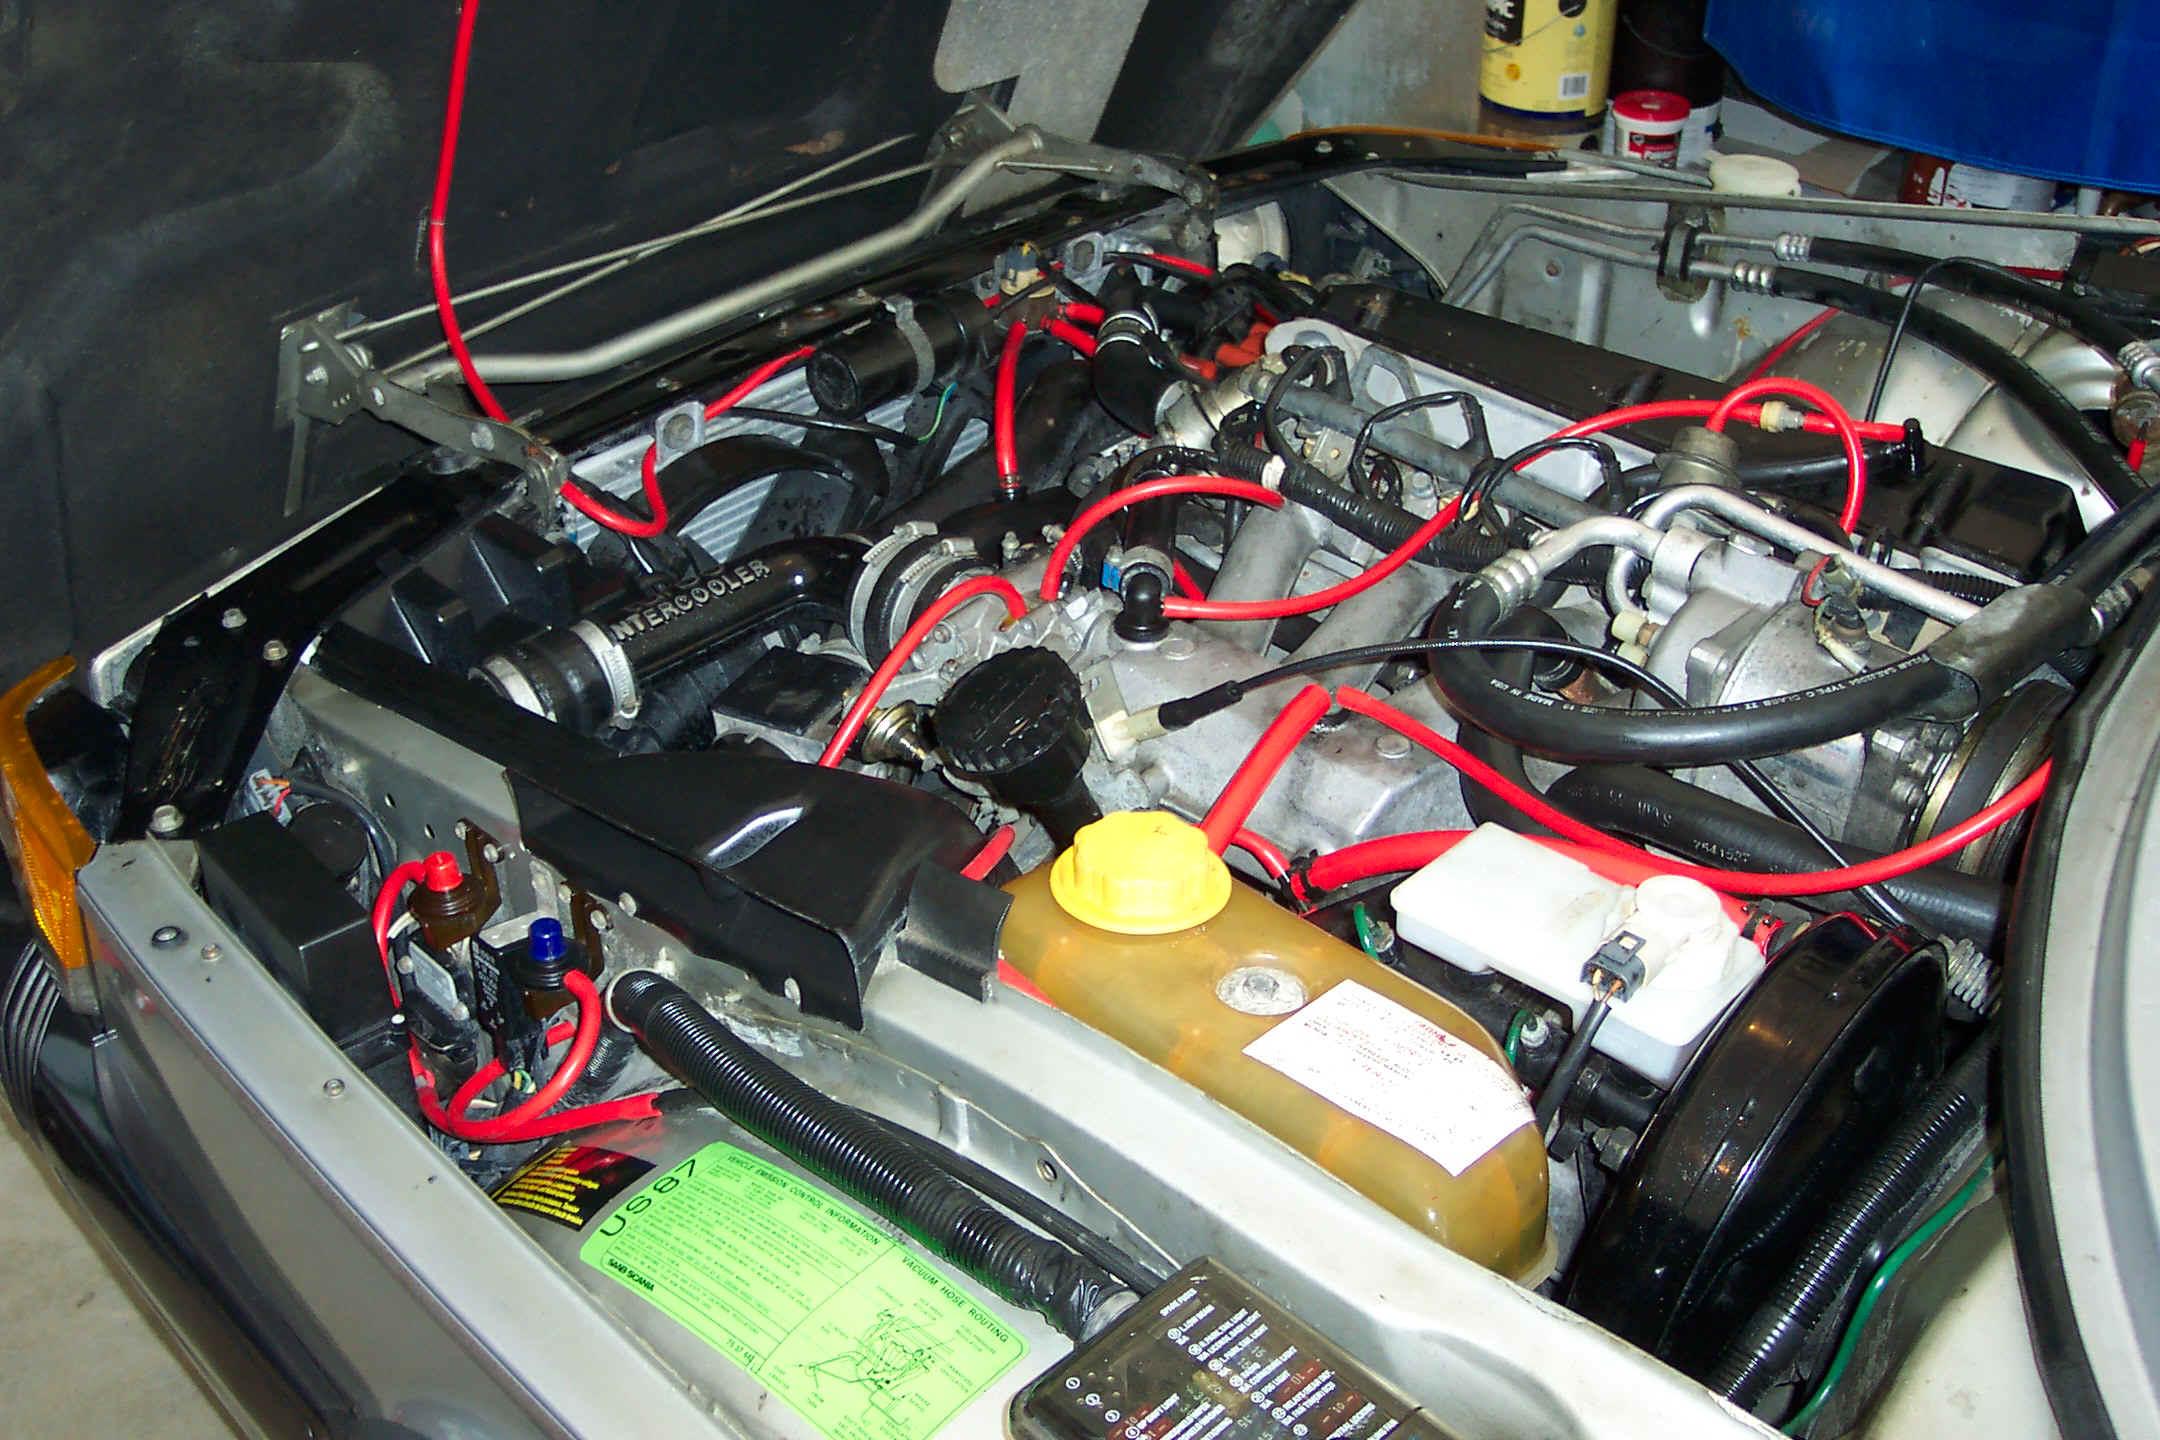 [SODI_2457]   CY_6862] Saab 900 Vacuum Hose Diagram Free Diagram   1993 Saab 900 Engine Diagram      Pila Expe Lave Itis Mohammedshrine Librar Wiring 101